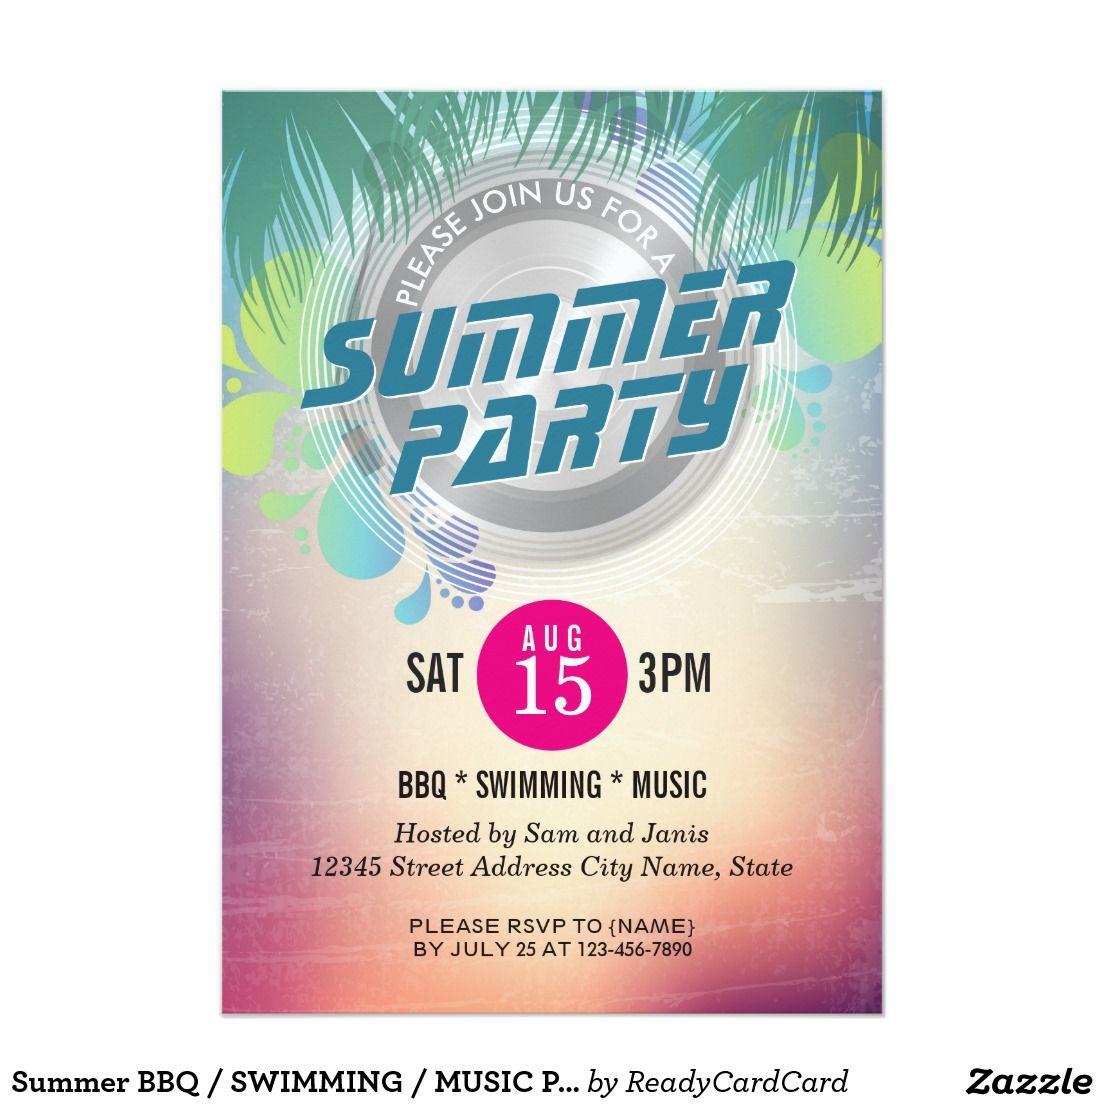 Summer BBQ / SWIMMING / MUSIC Party Invitation